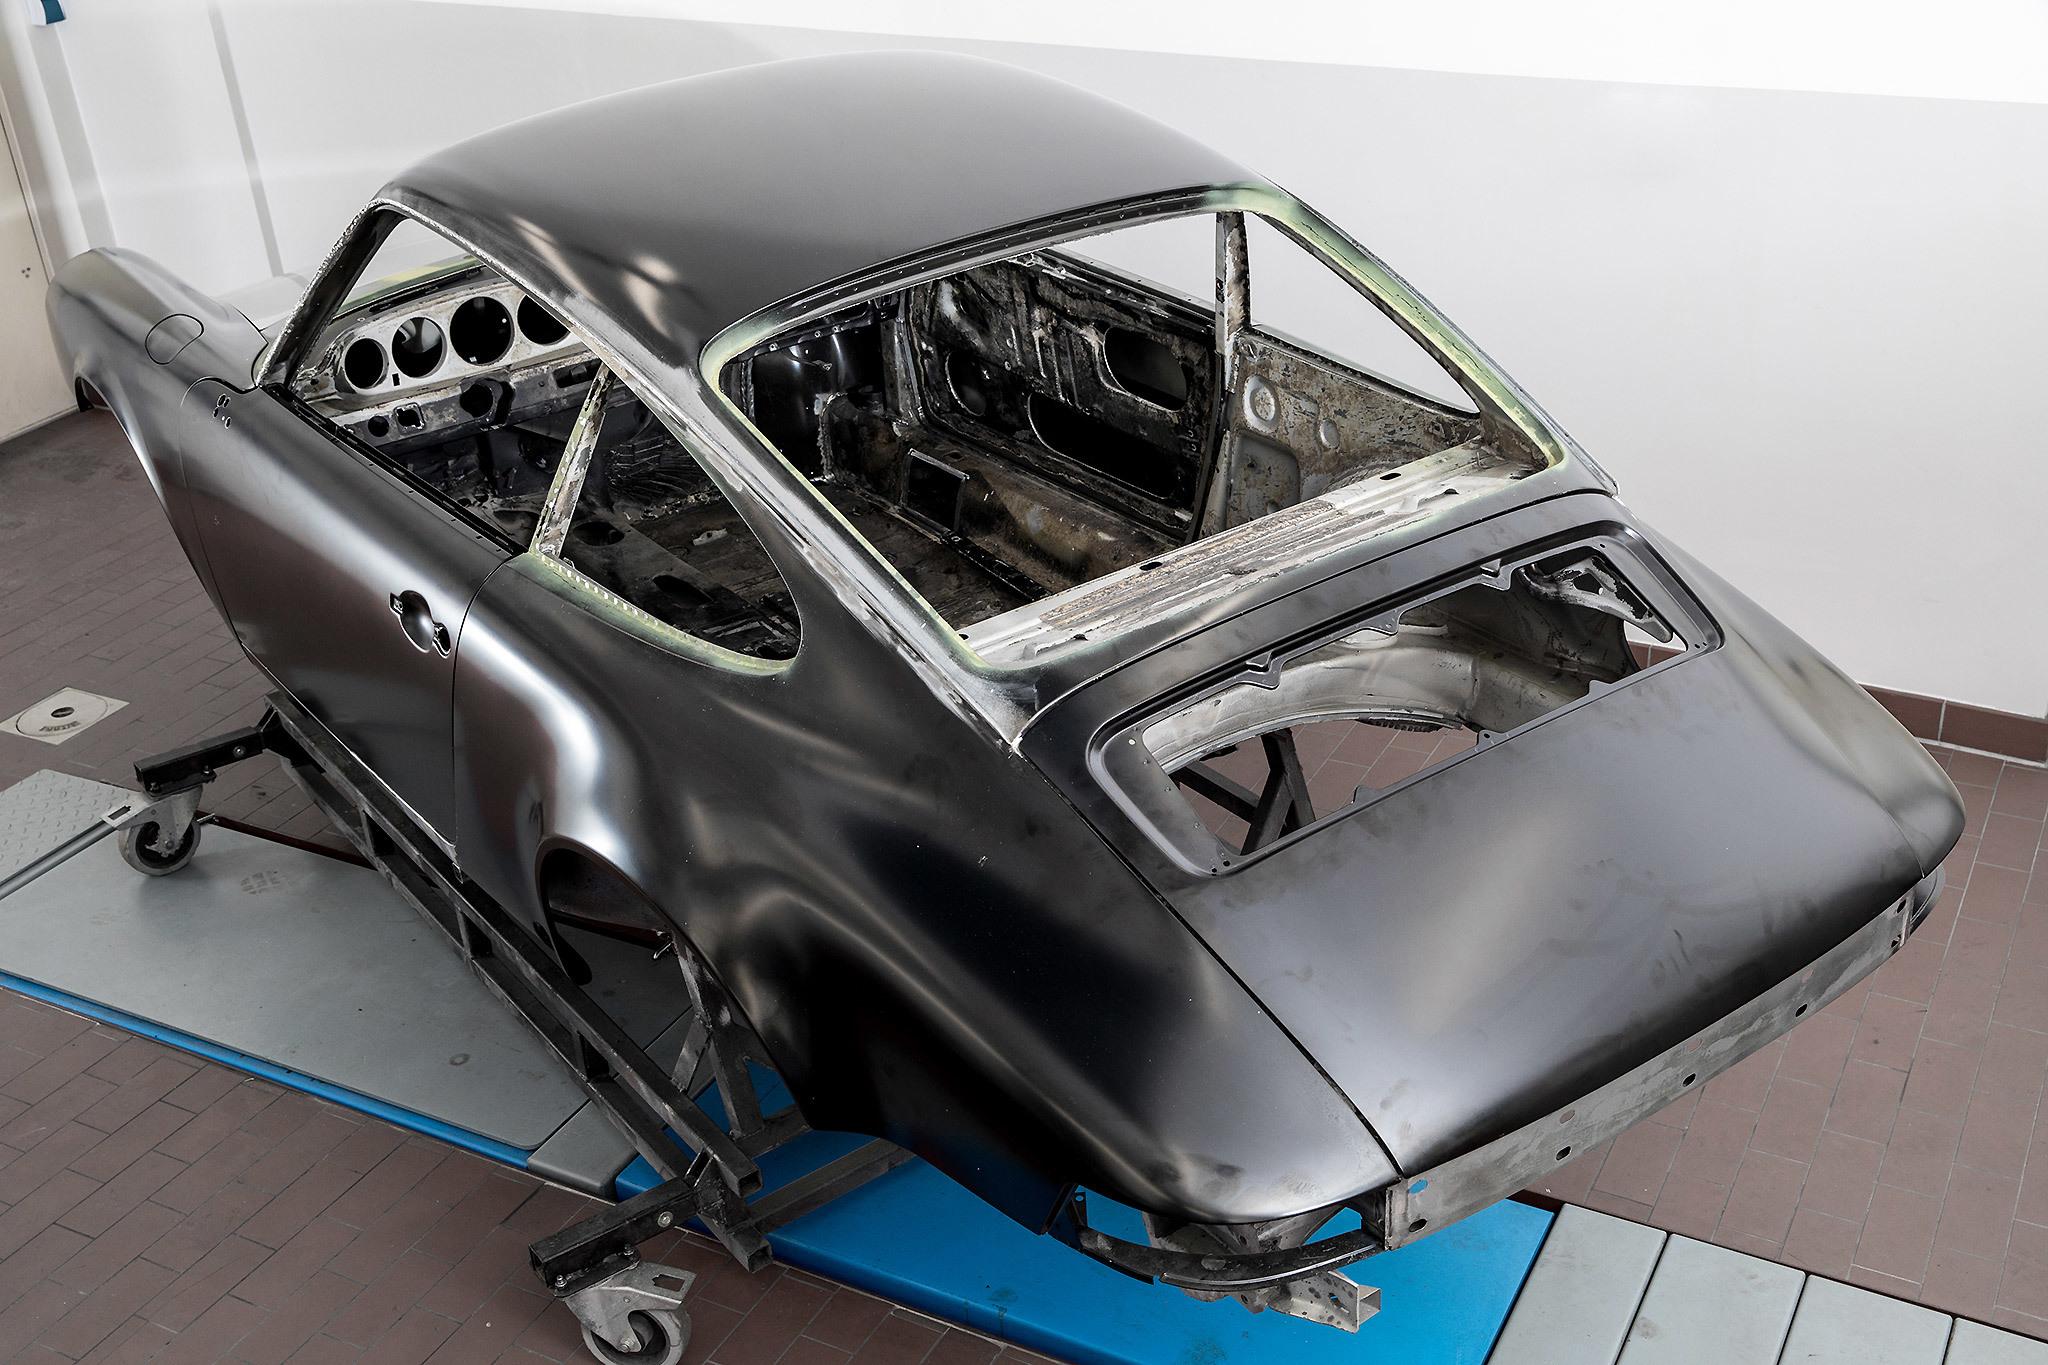 X Bionic Porsche Carrera 3 0 Restaurations Projekt 2017 Bild01